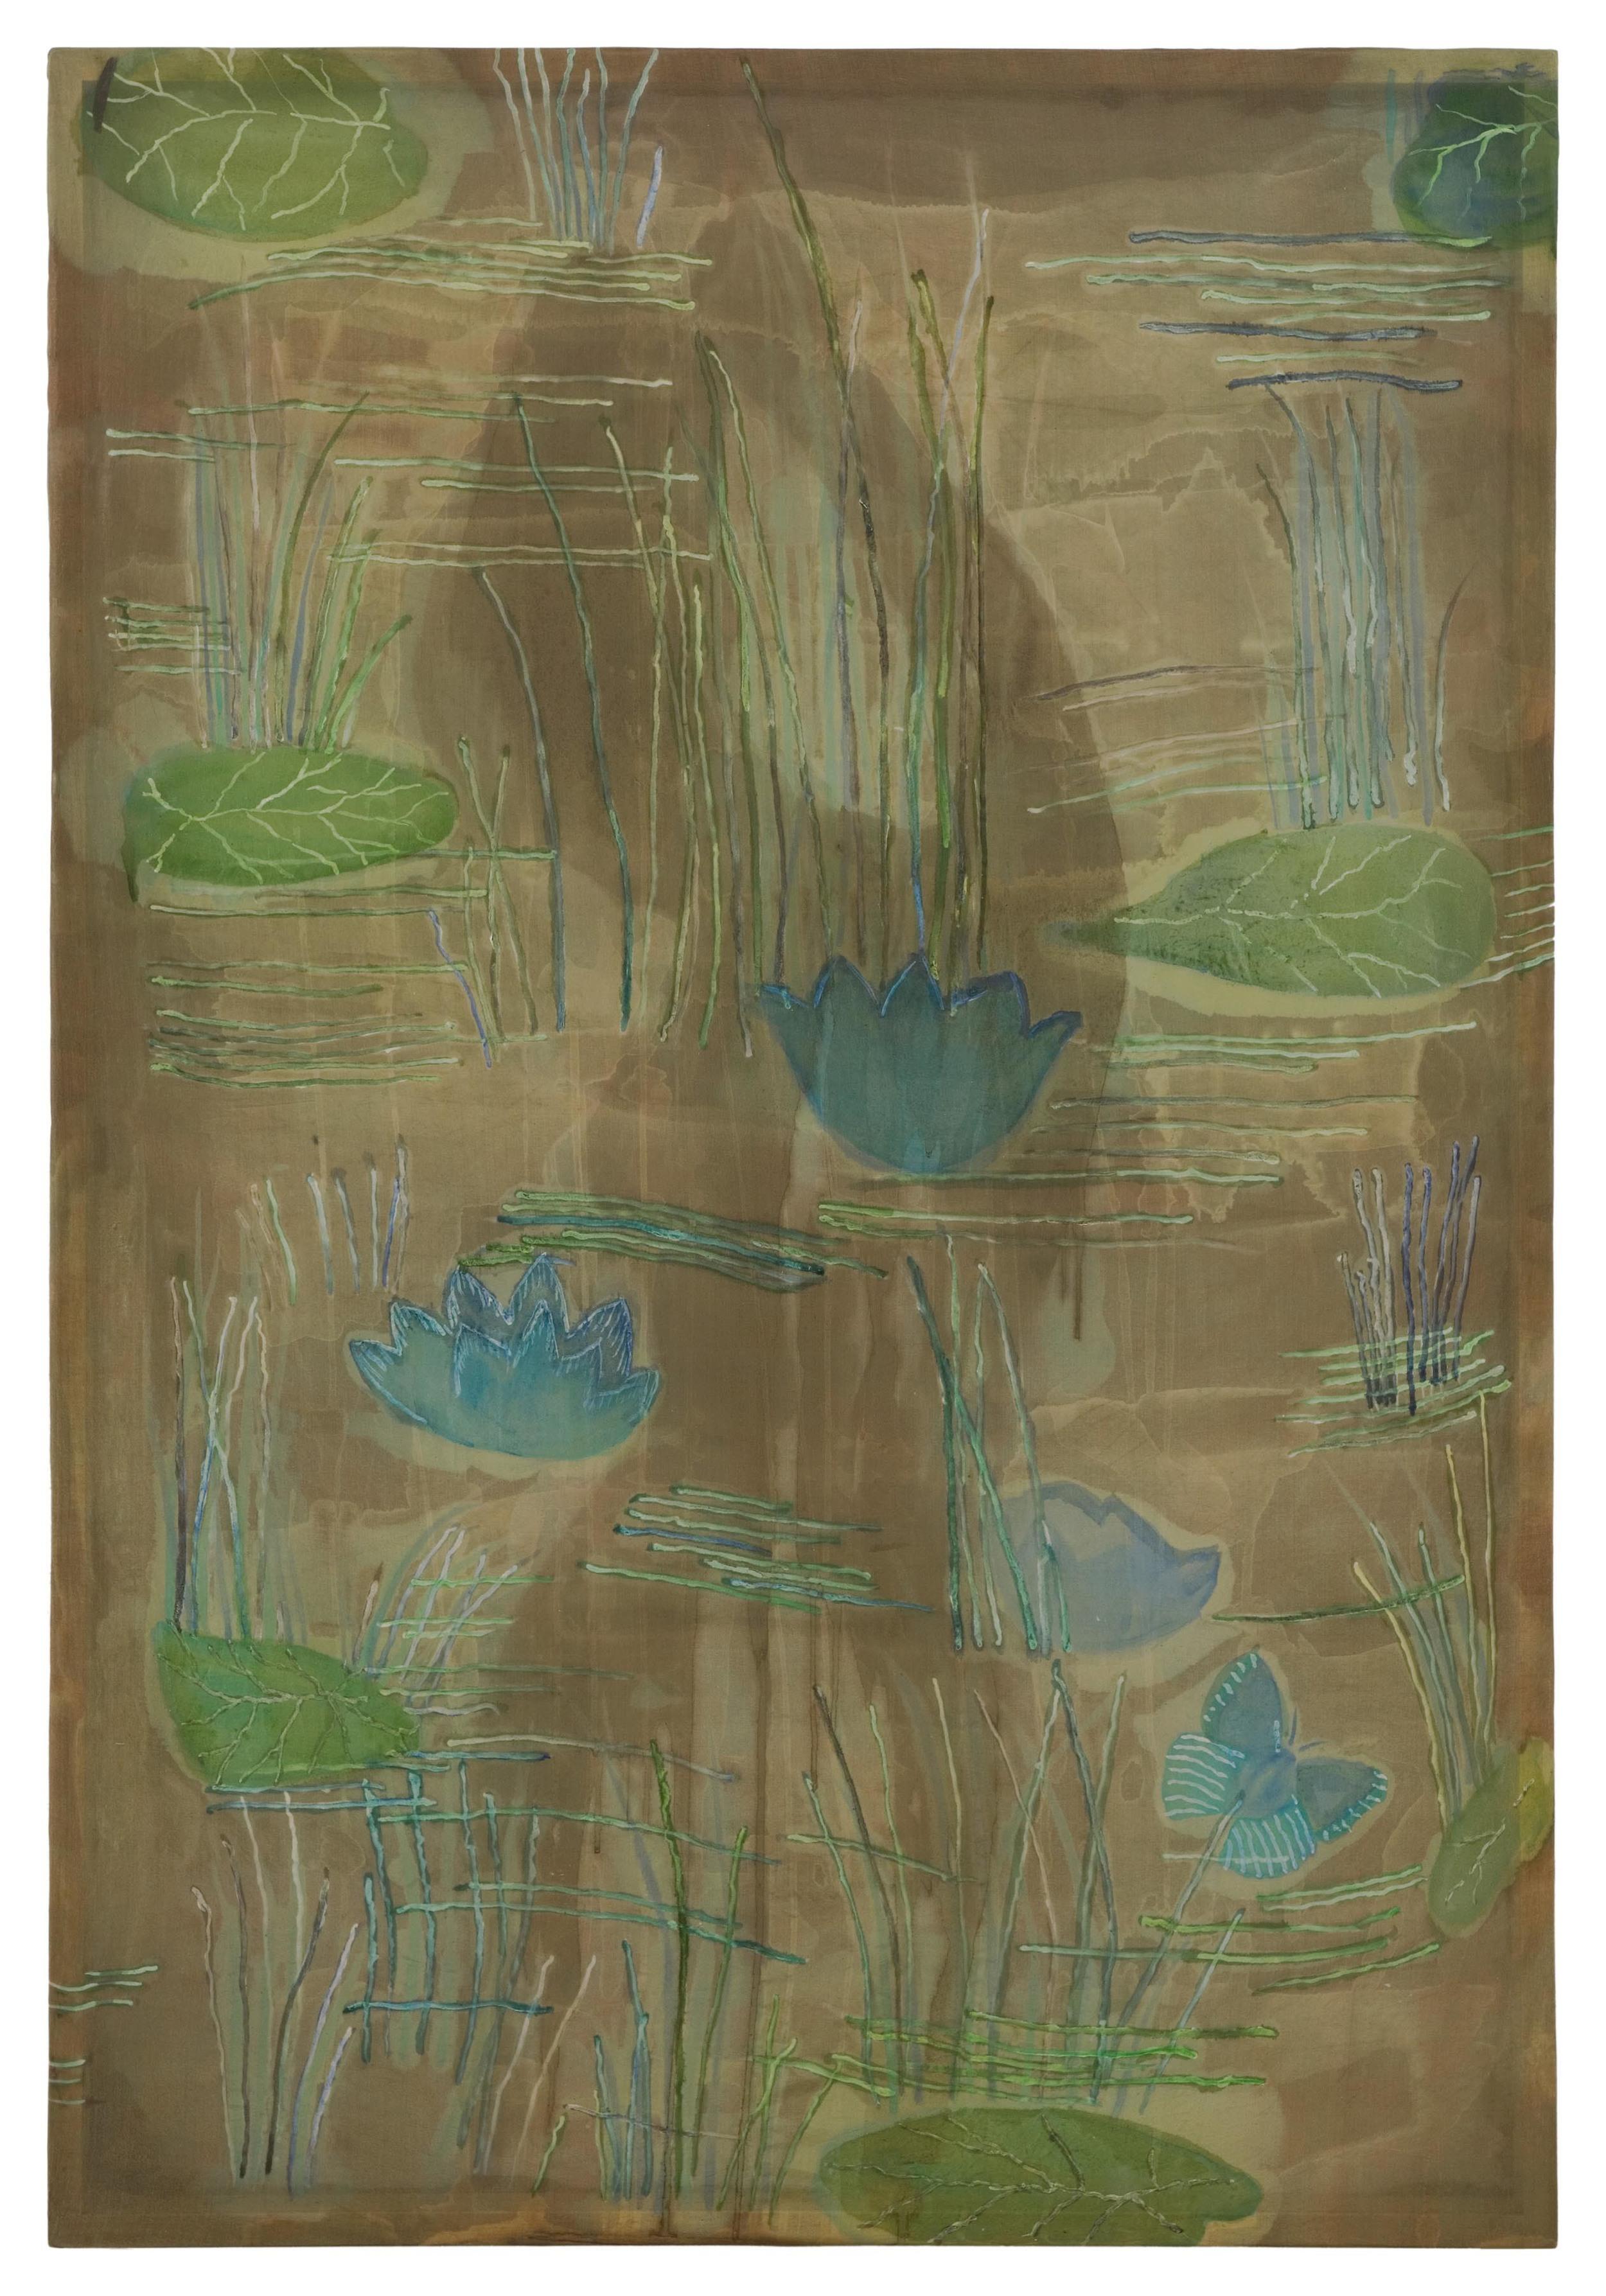 Shannon Bool Shower in Sultanahmet 2007 Oil and Batik on Silk 57 x 83 cm